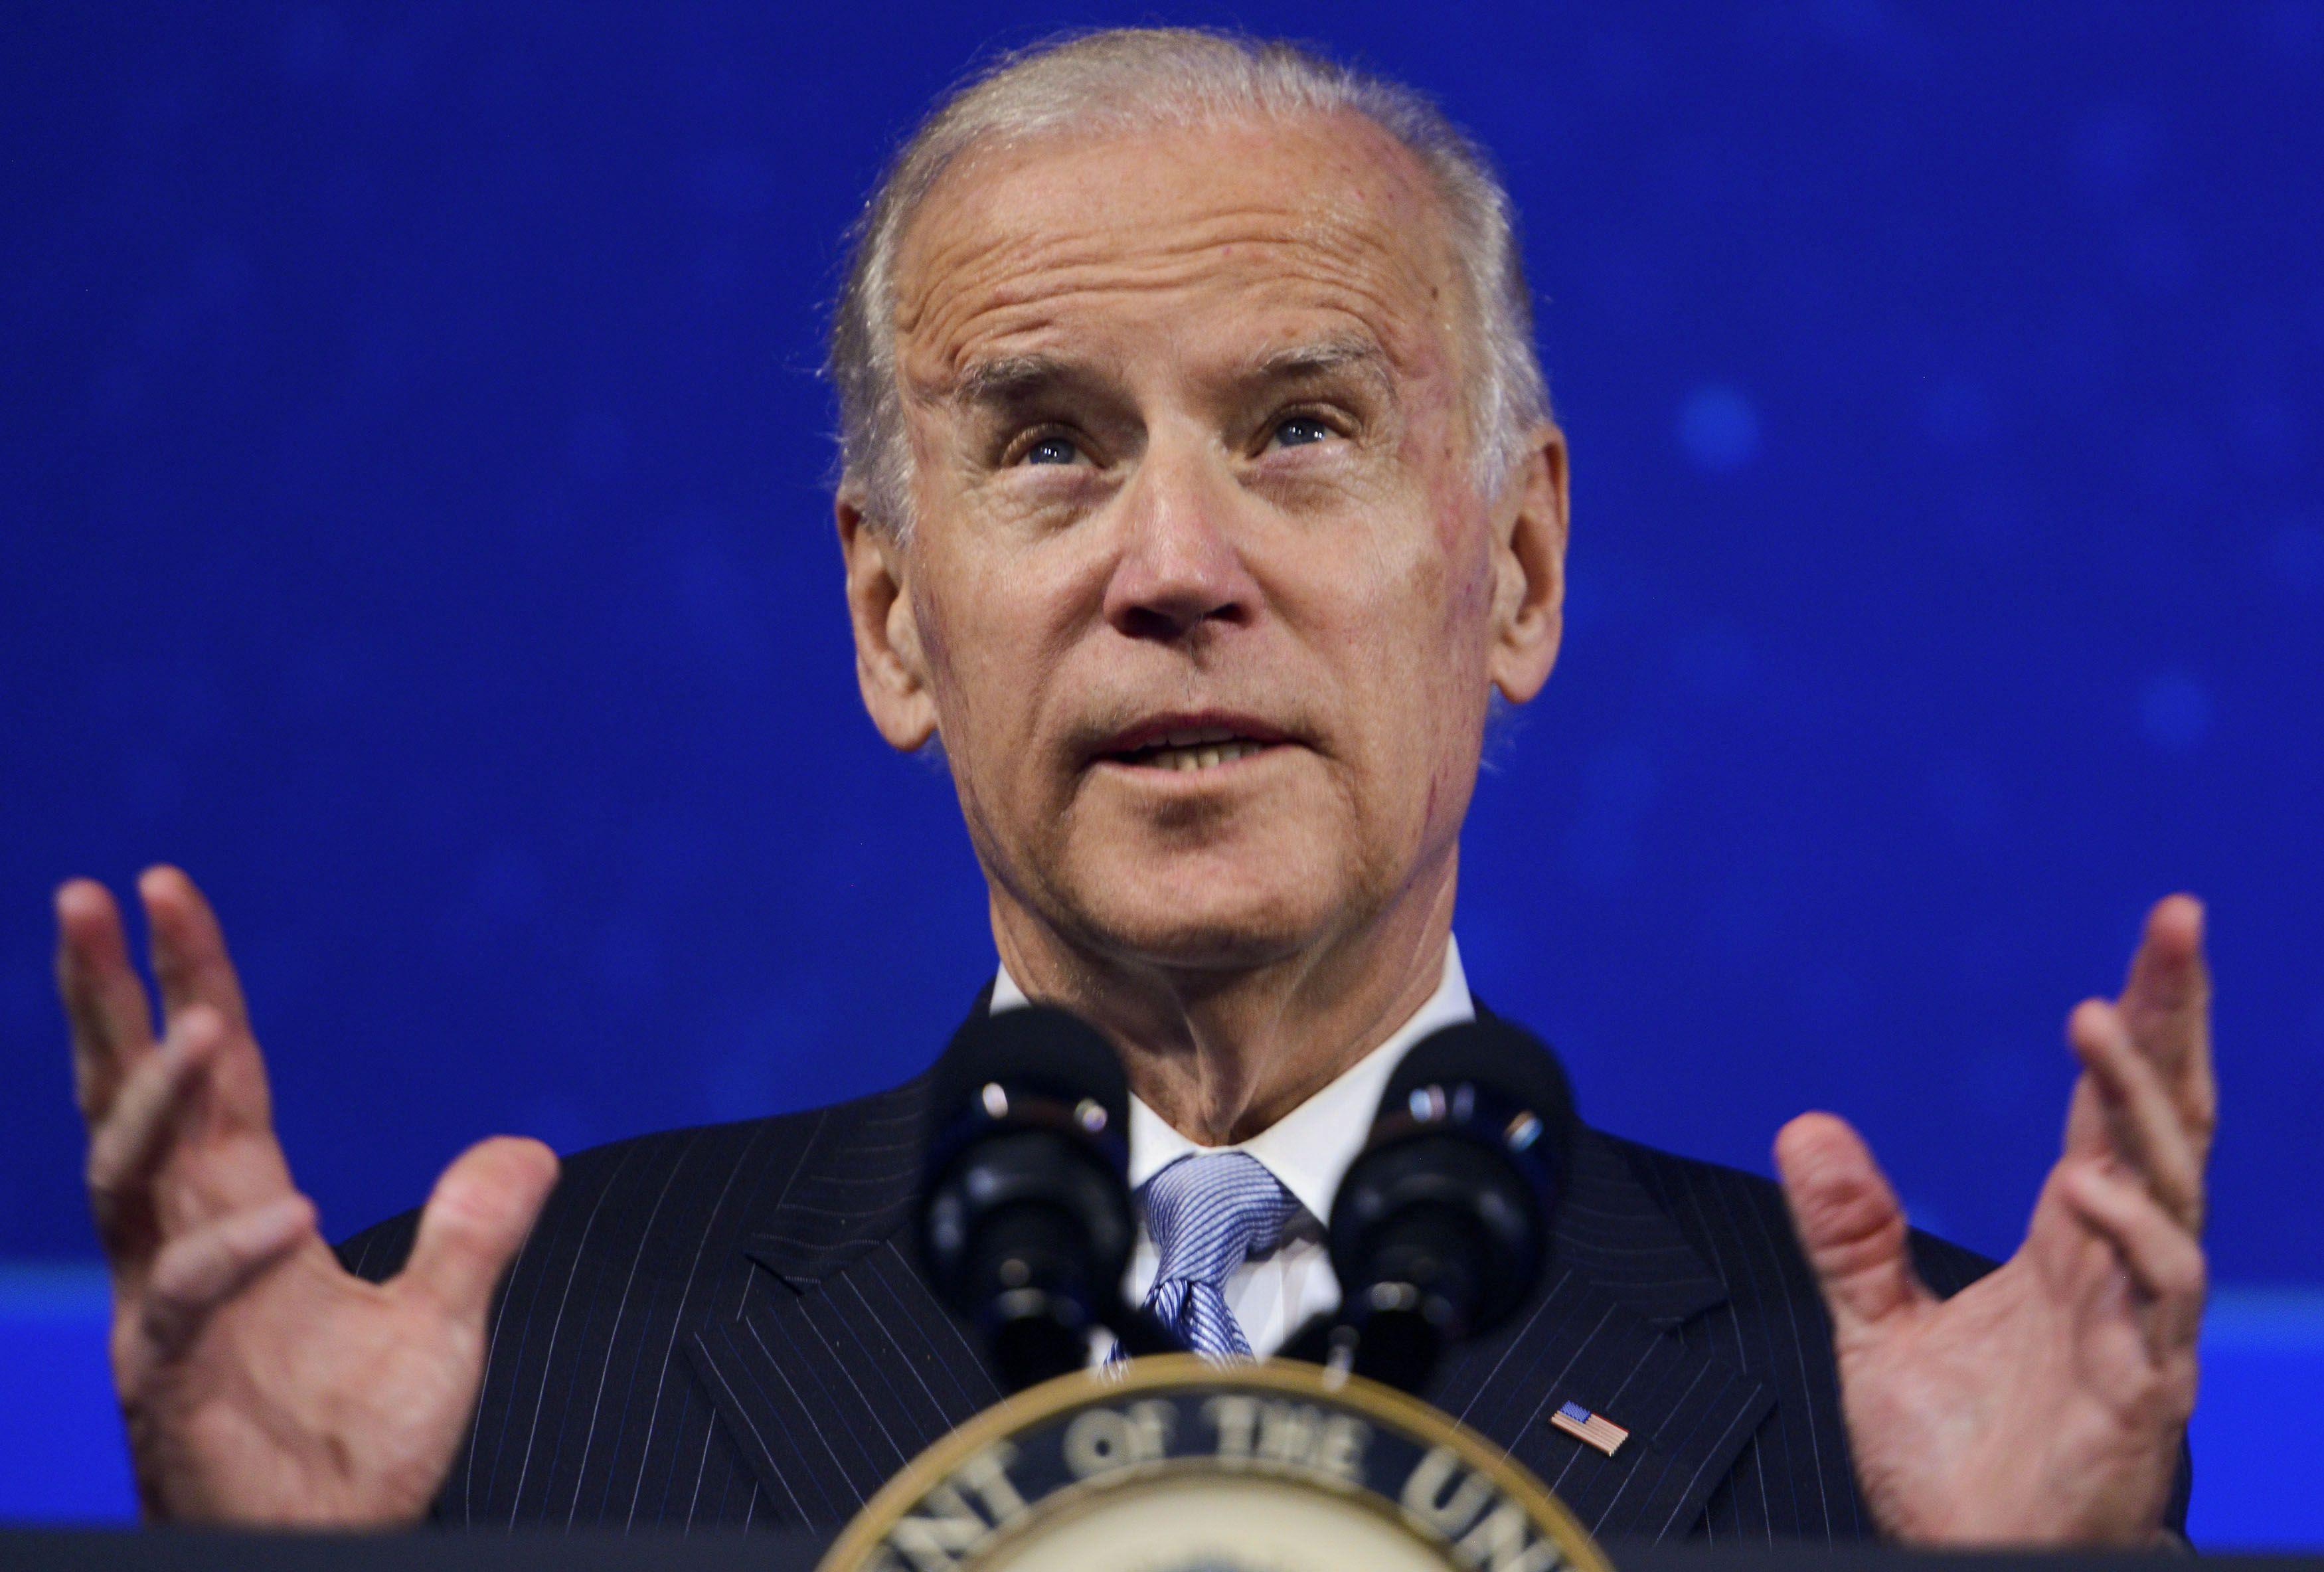 Joe Biden's Economic Plan: Save the Middle Class to Save America